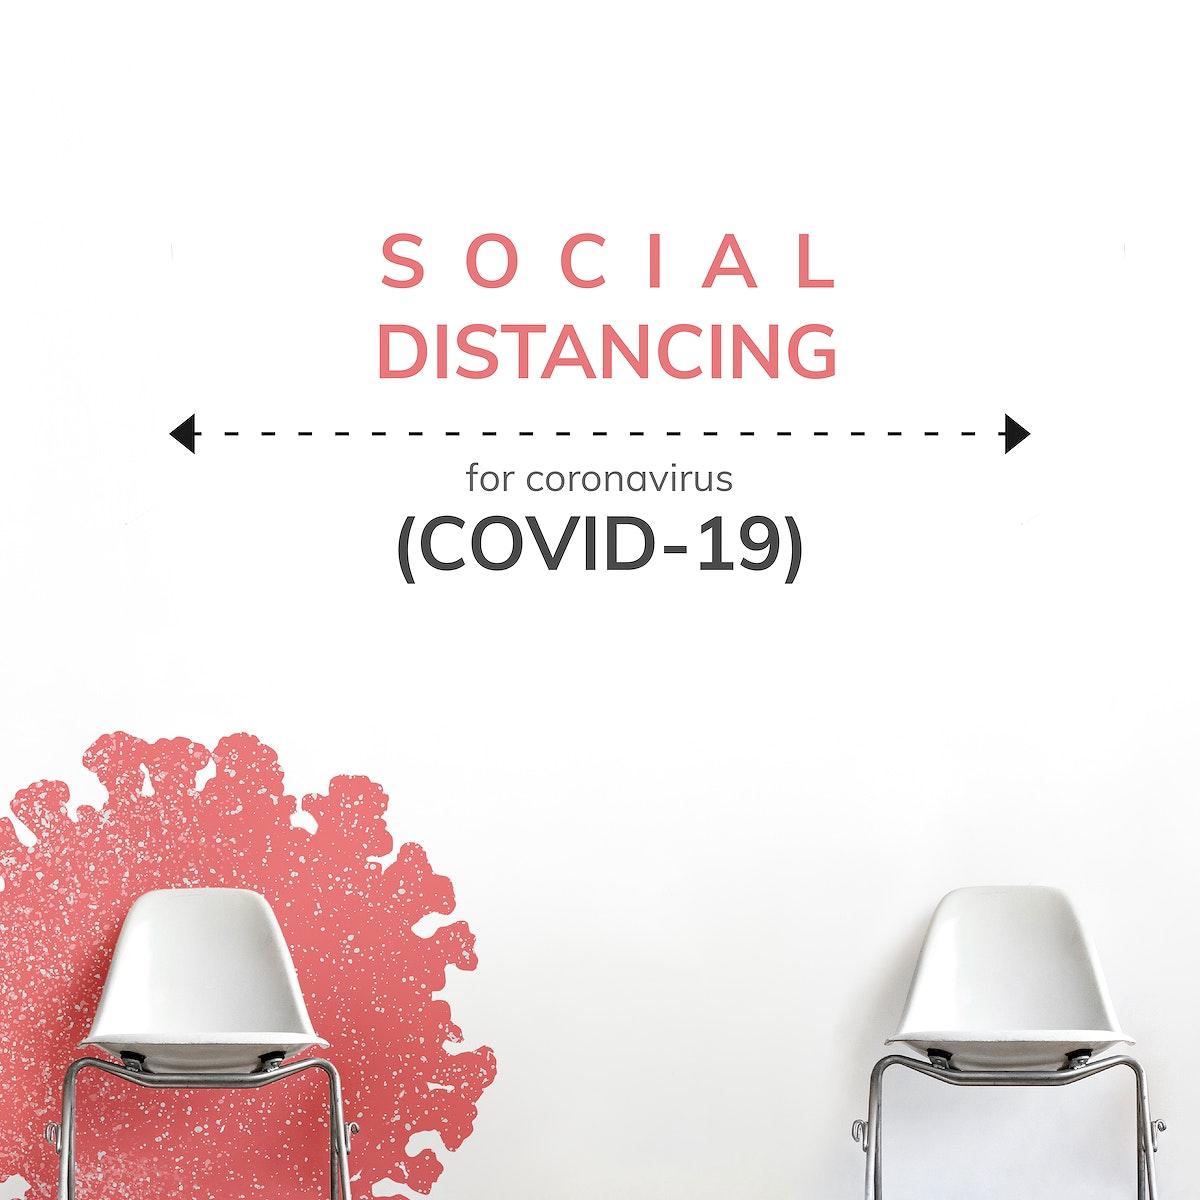 Social distancing during coronavirus pandemic social template vector